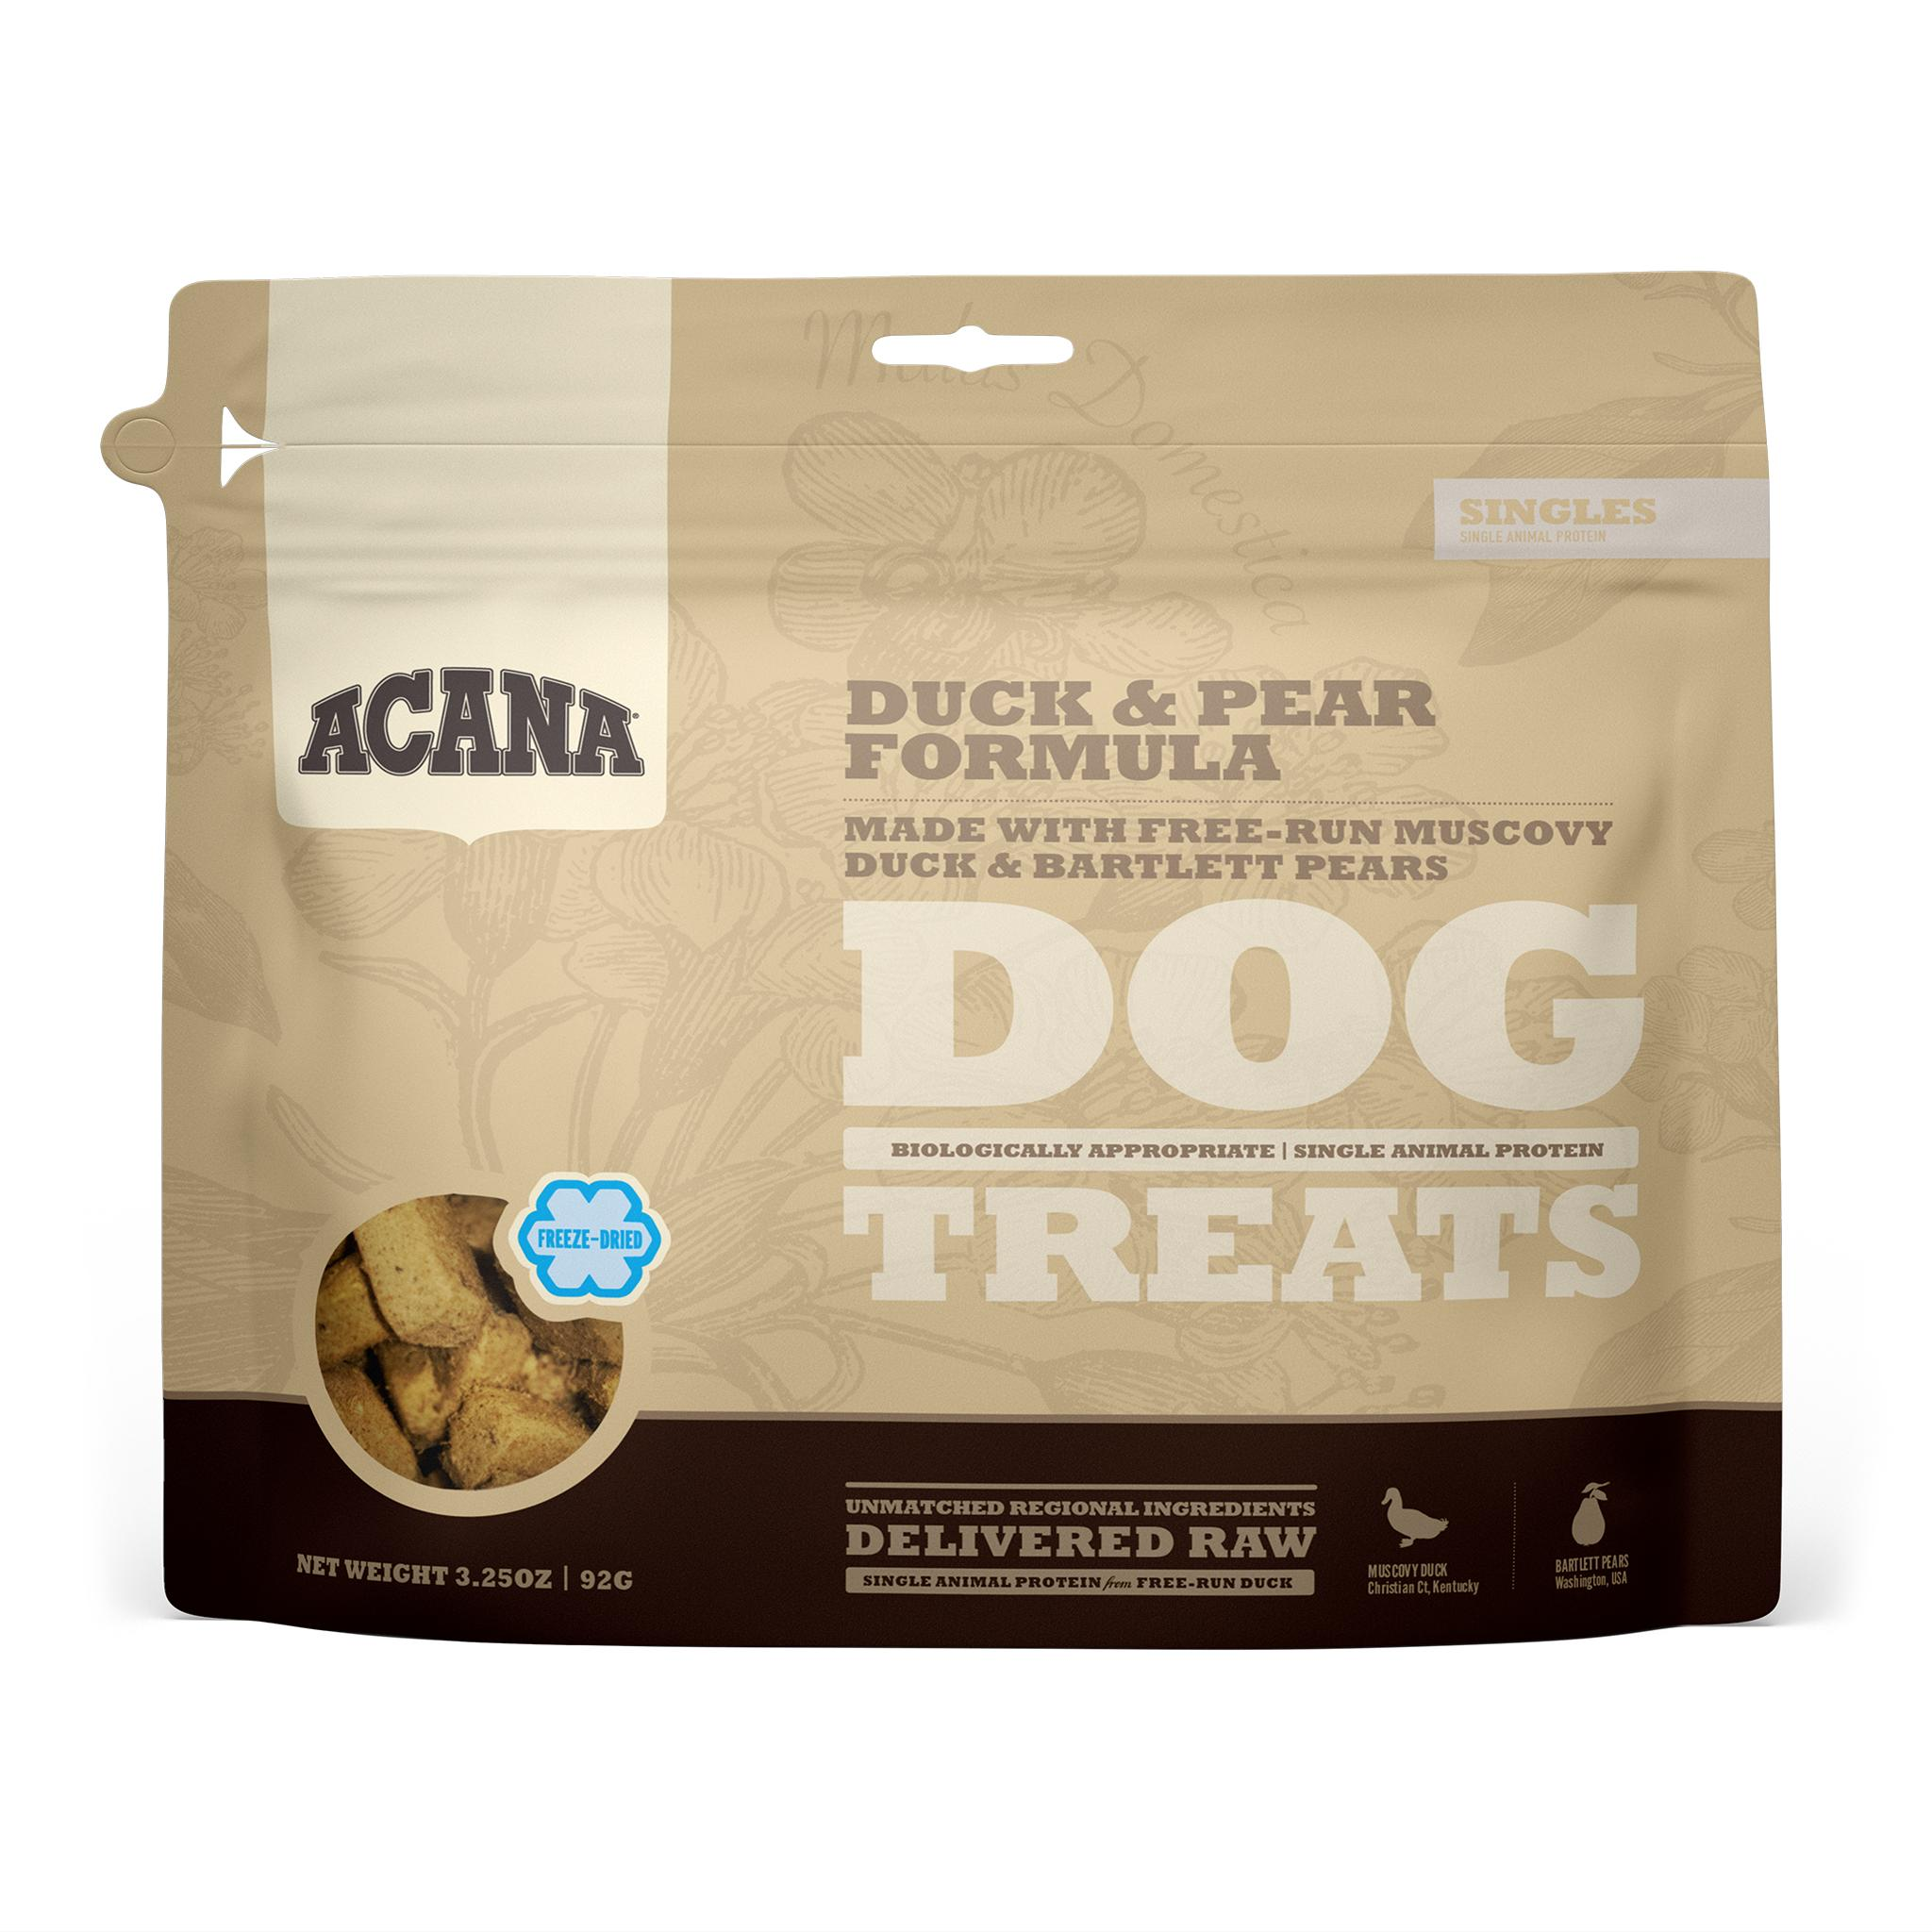 ACANA Singles Duck & Pear Grain-Free Freeze-Dried Dog Treats, 3.25-oz